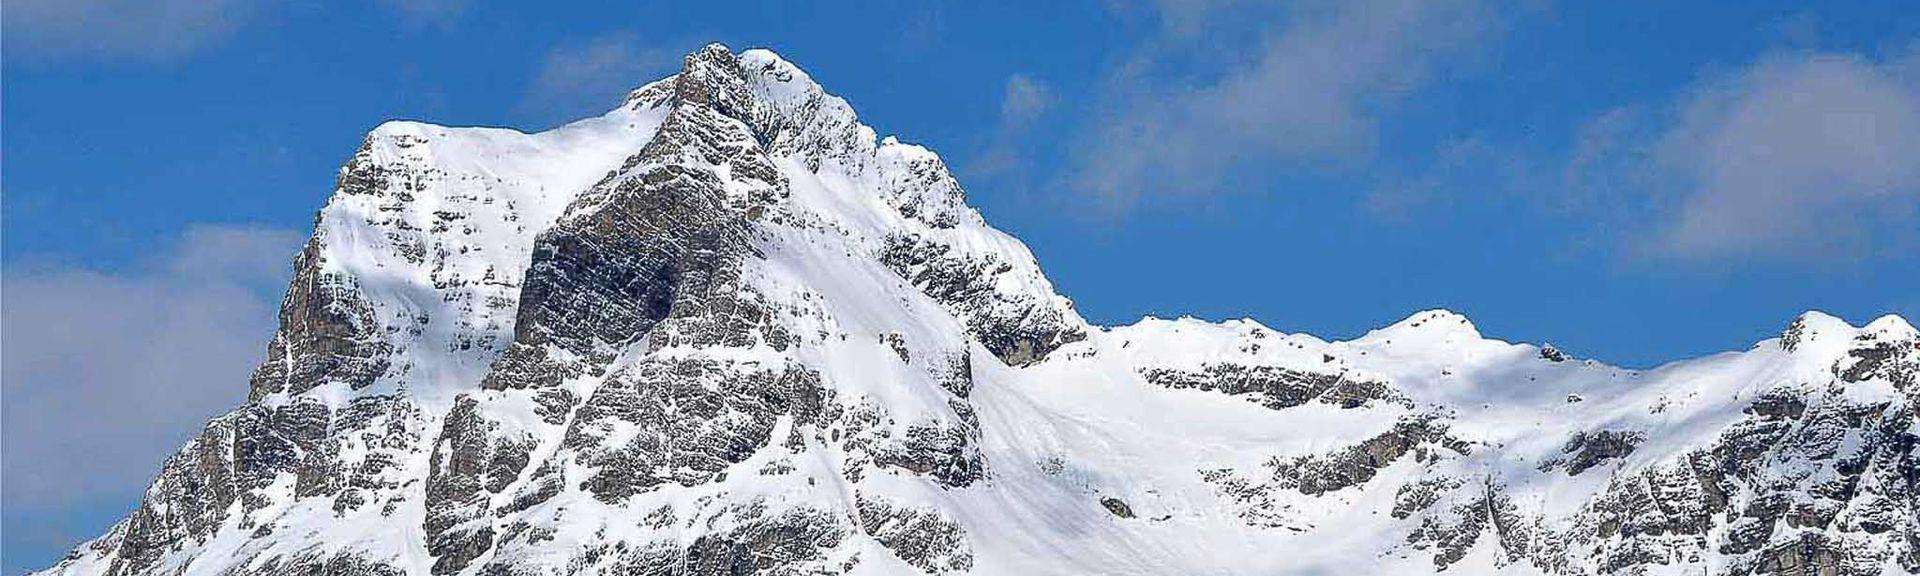 Steeg, Tirol, Áustria